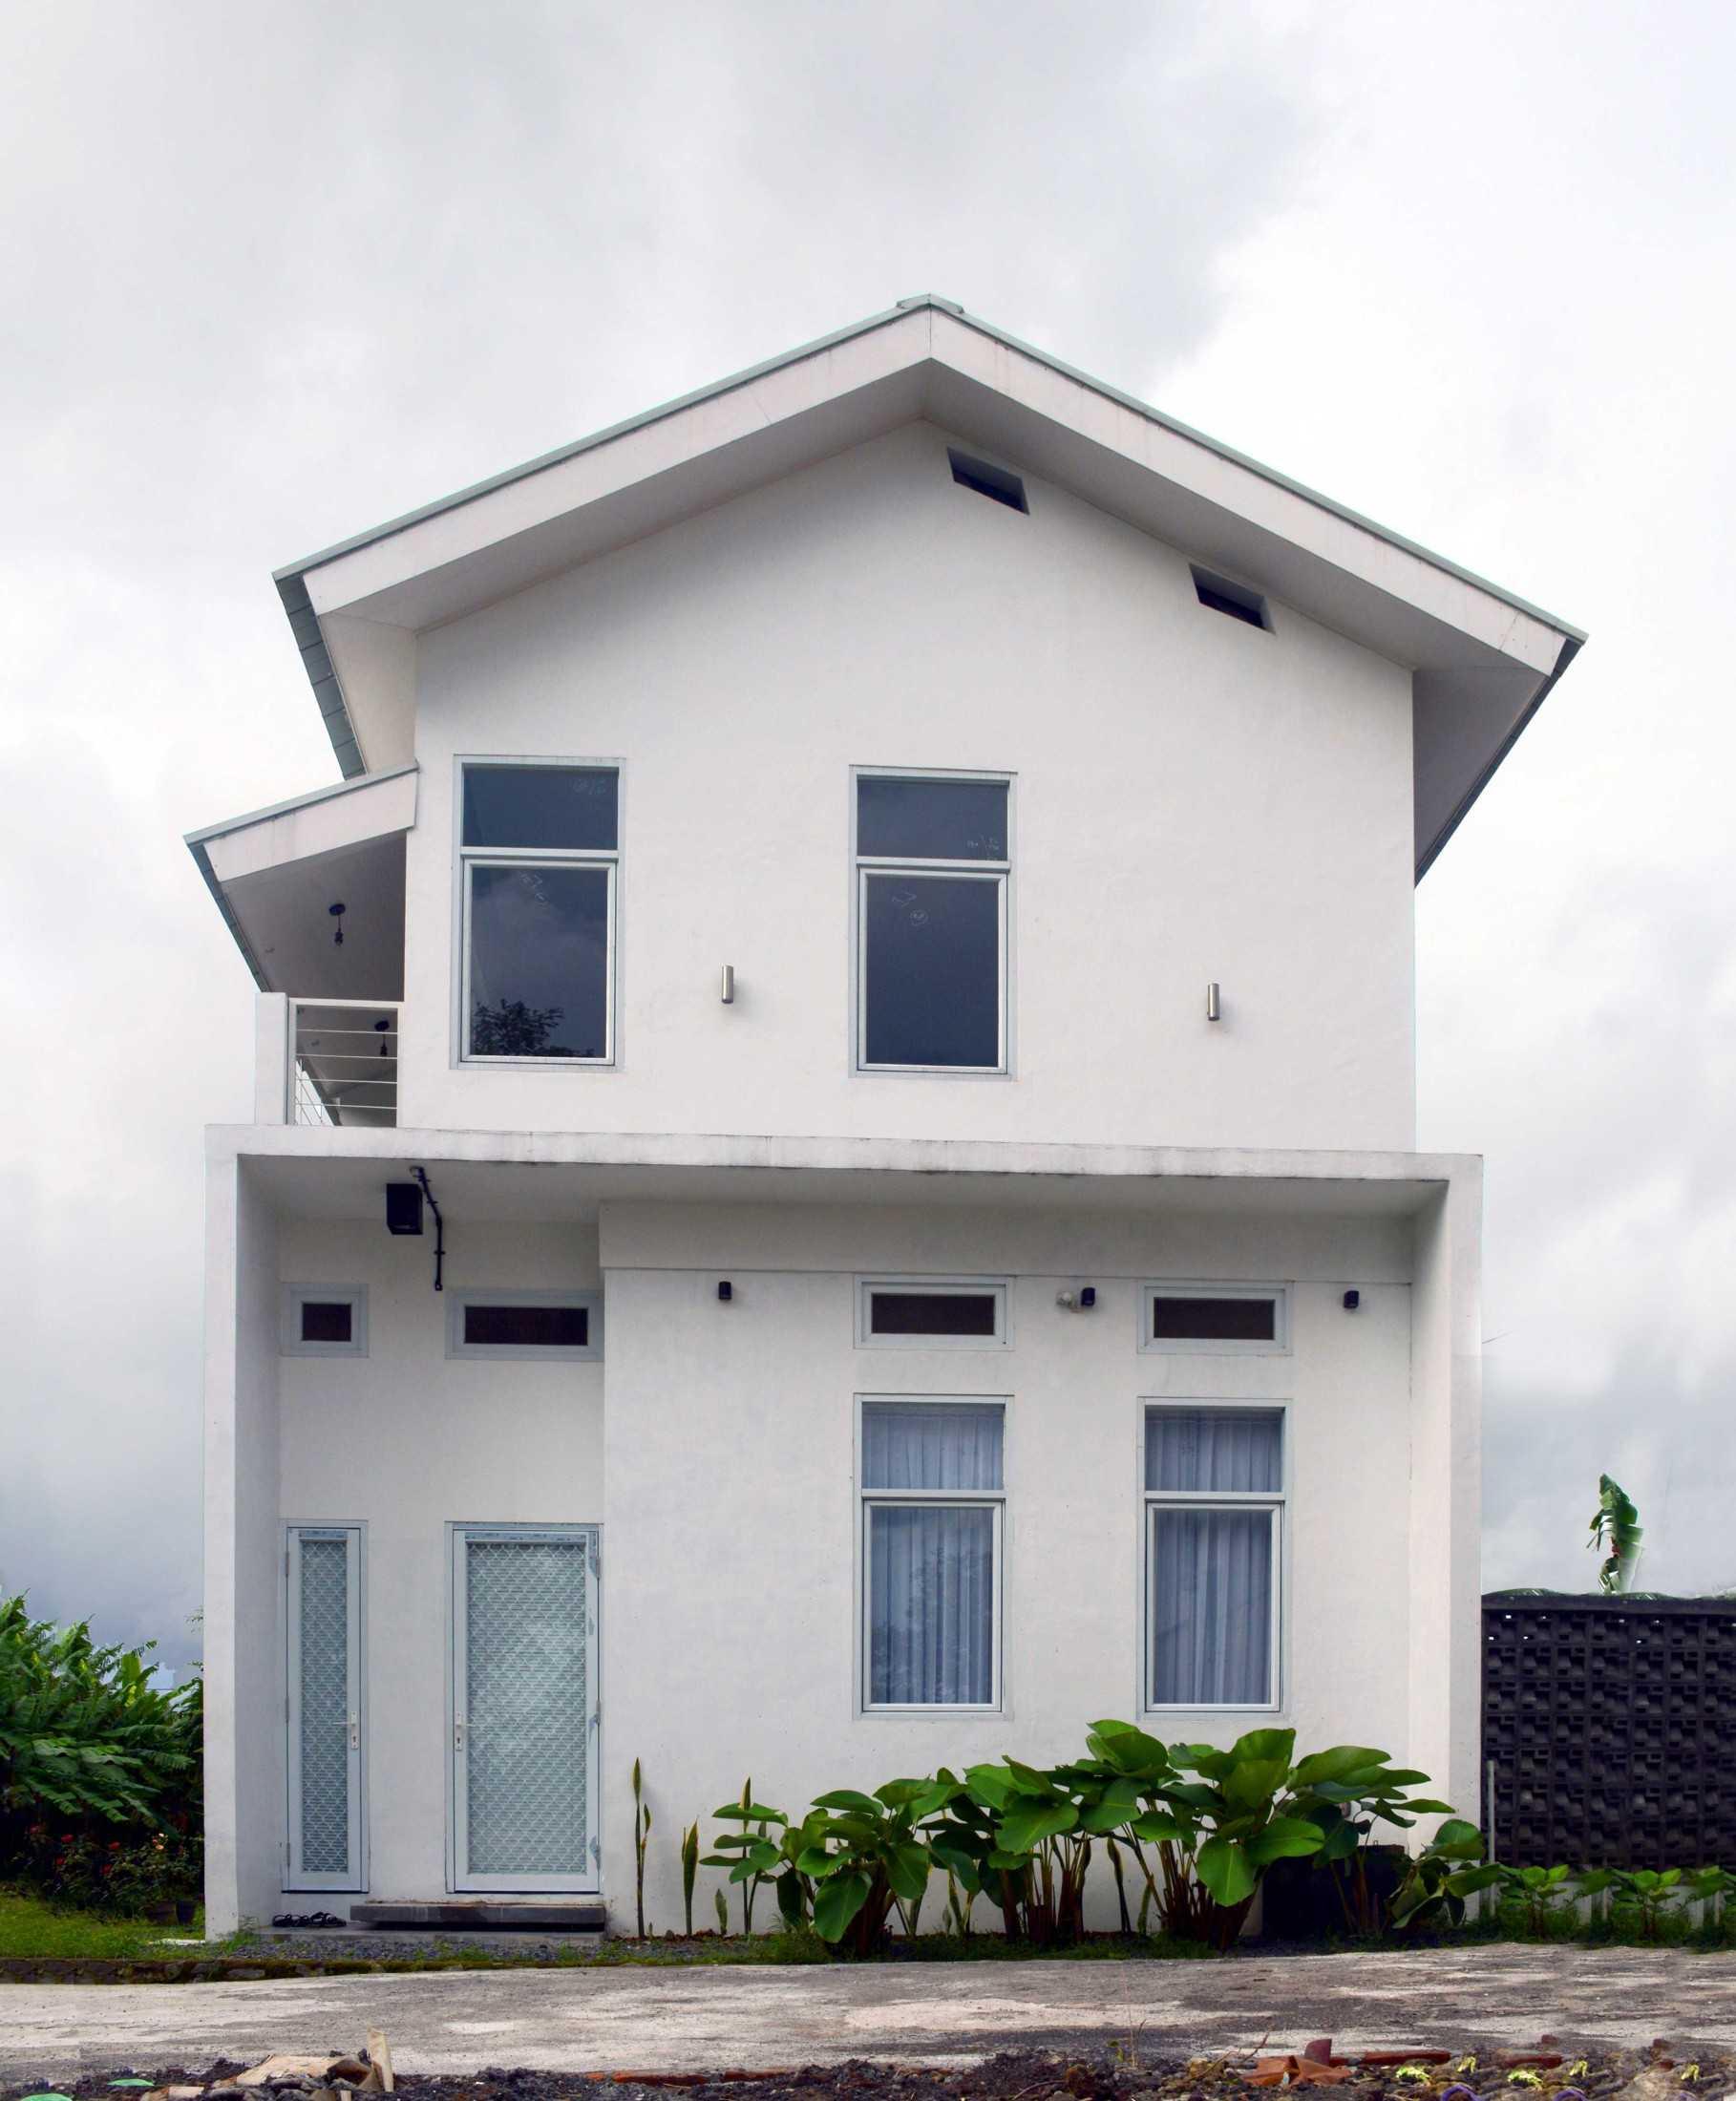 Gfs Architect T&d House Semarang, Jawa Tengah, Indonesia Semarang, Jawa Tengah, Indonesia Gigih-F-Saputro-Td-House  111972